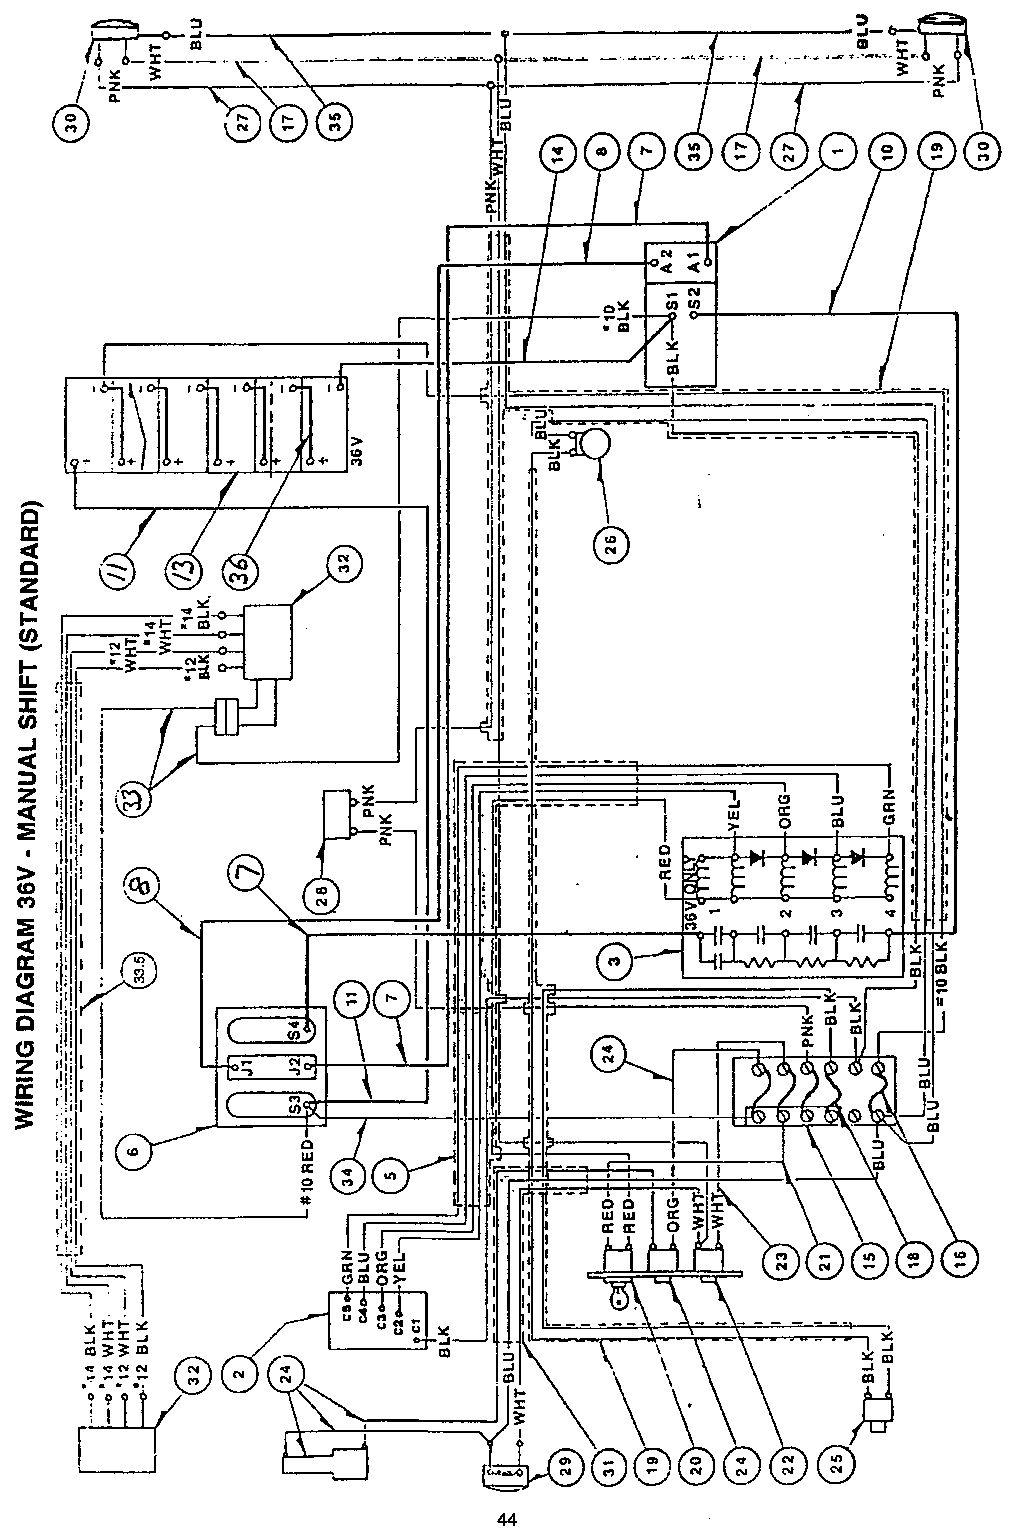 Westinghouse 436 Golf Cart Wiring Diagram